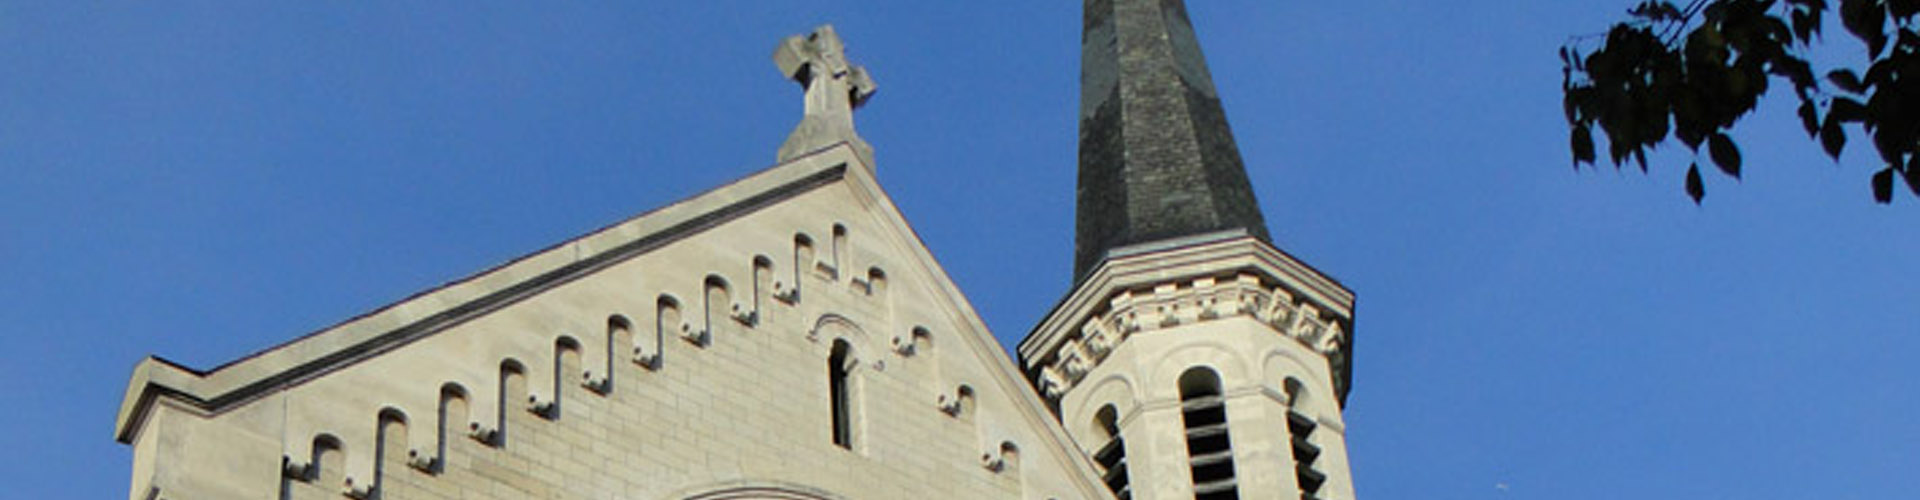 église protestante de Batignolles